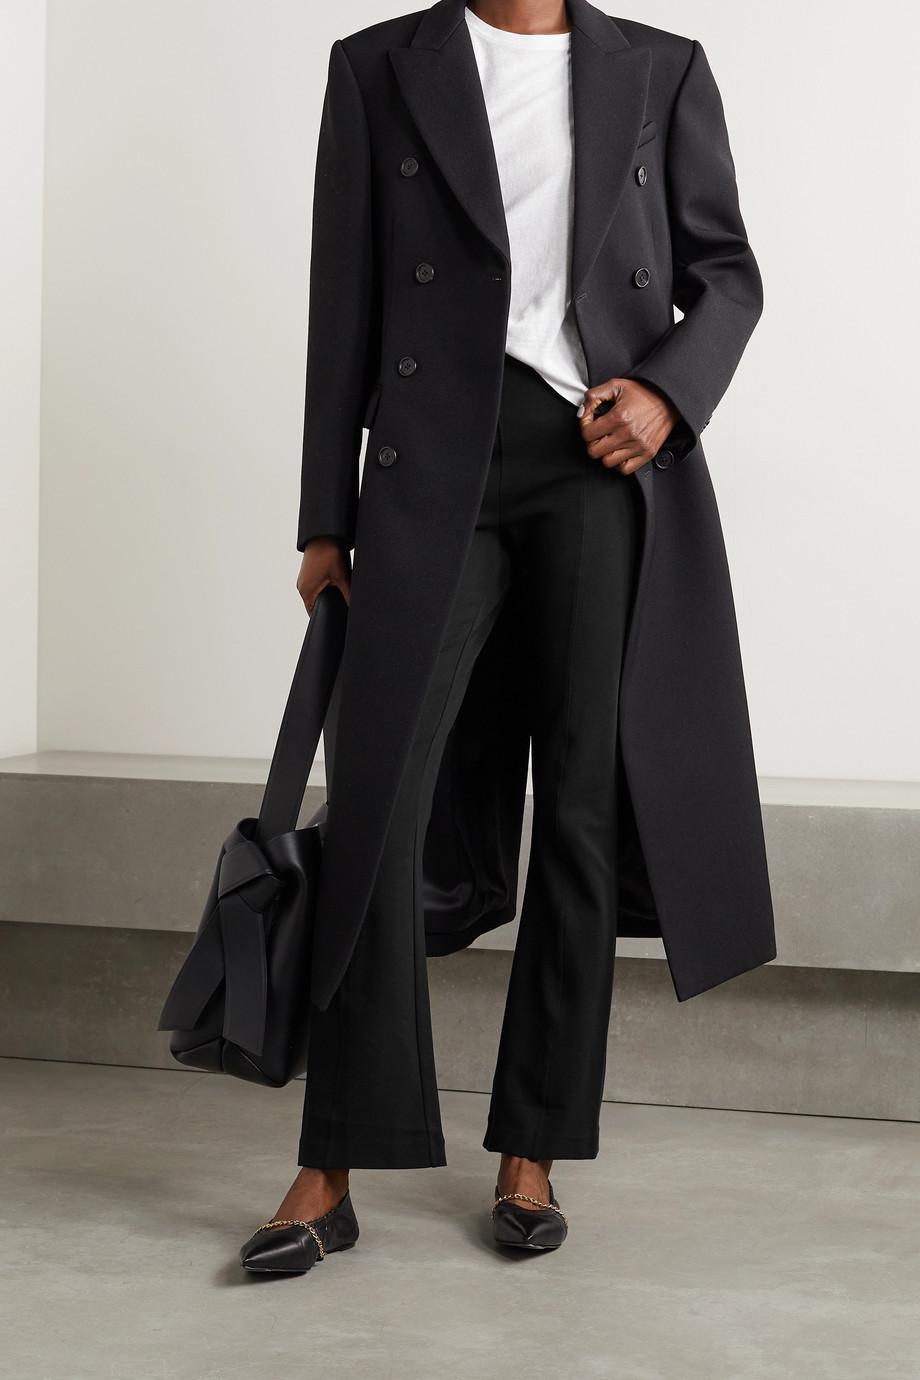 Ninety Percent 【NET SUSTAIN】有机棉质混纺平纹布喇叭裤